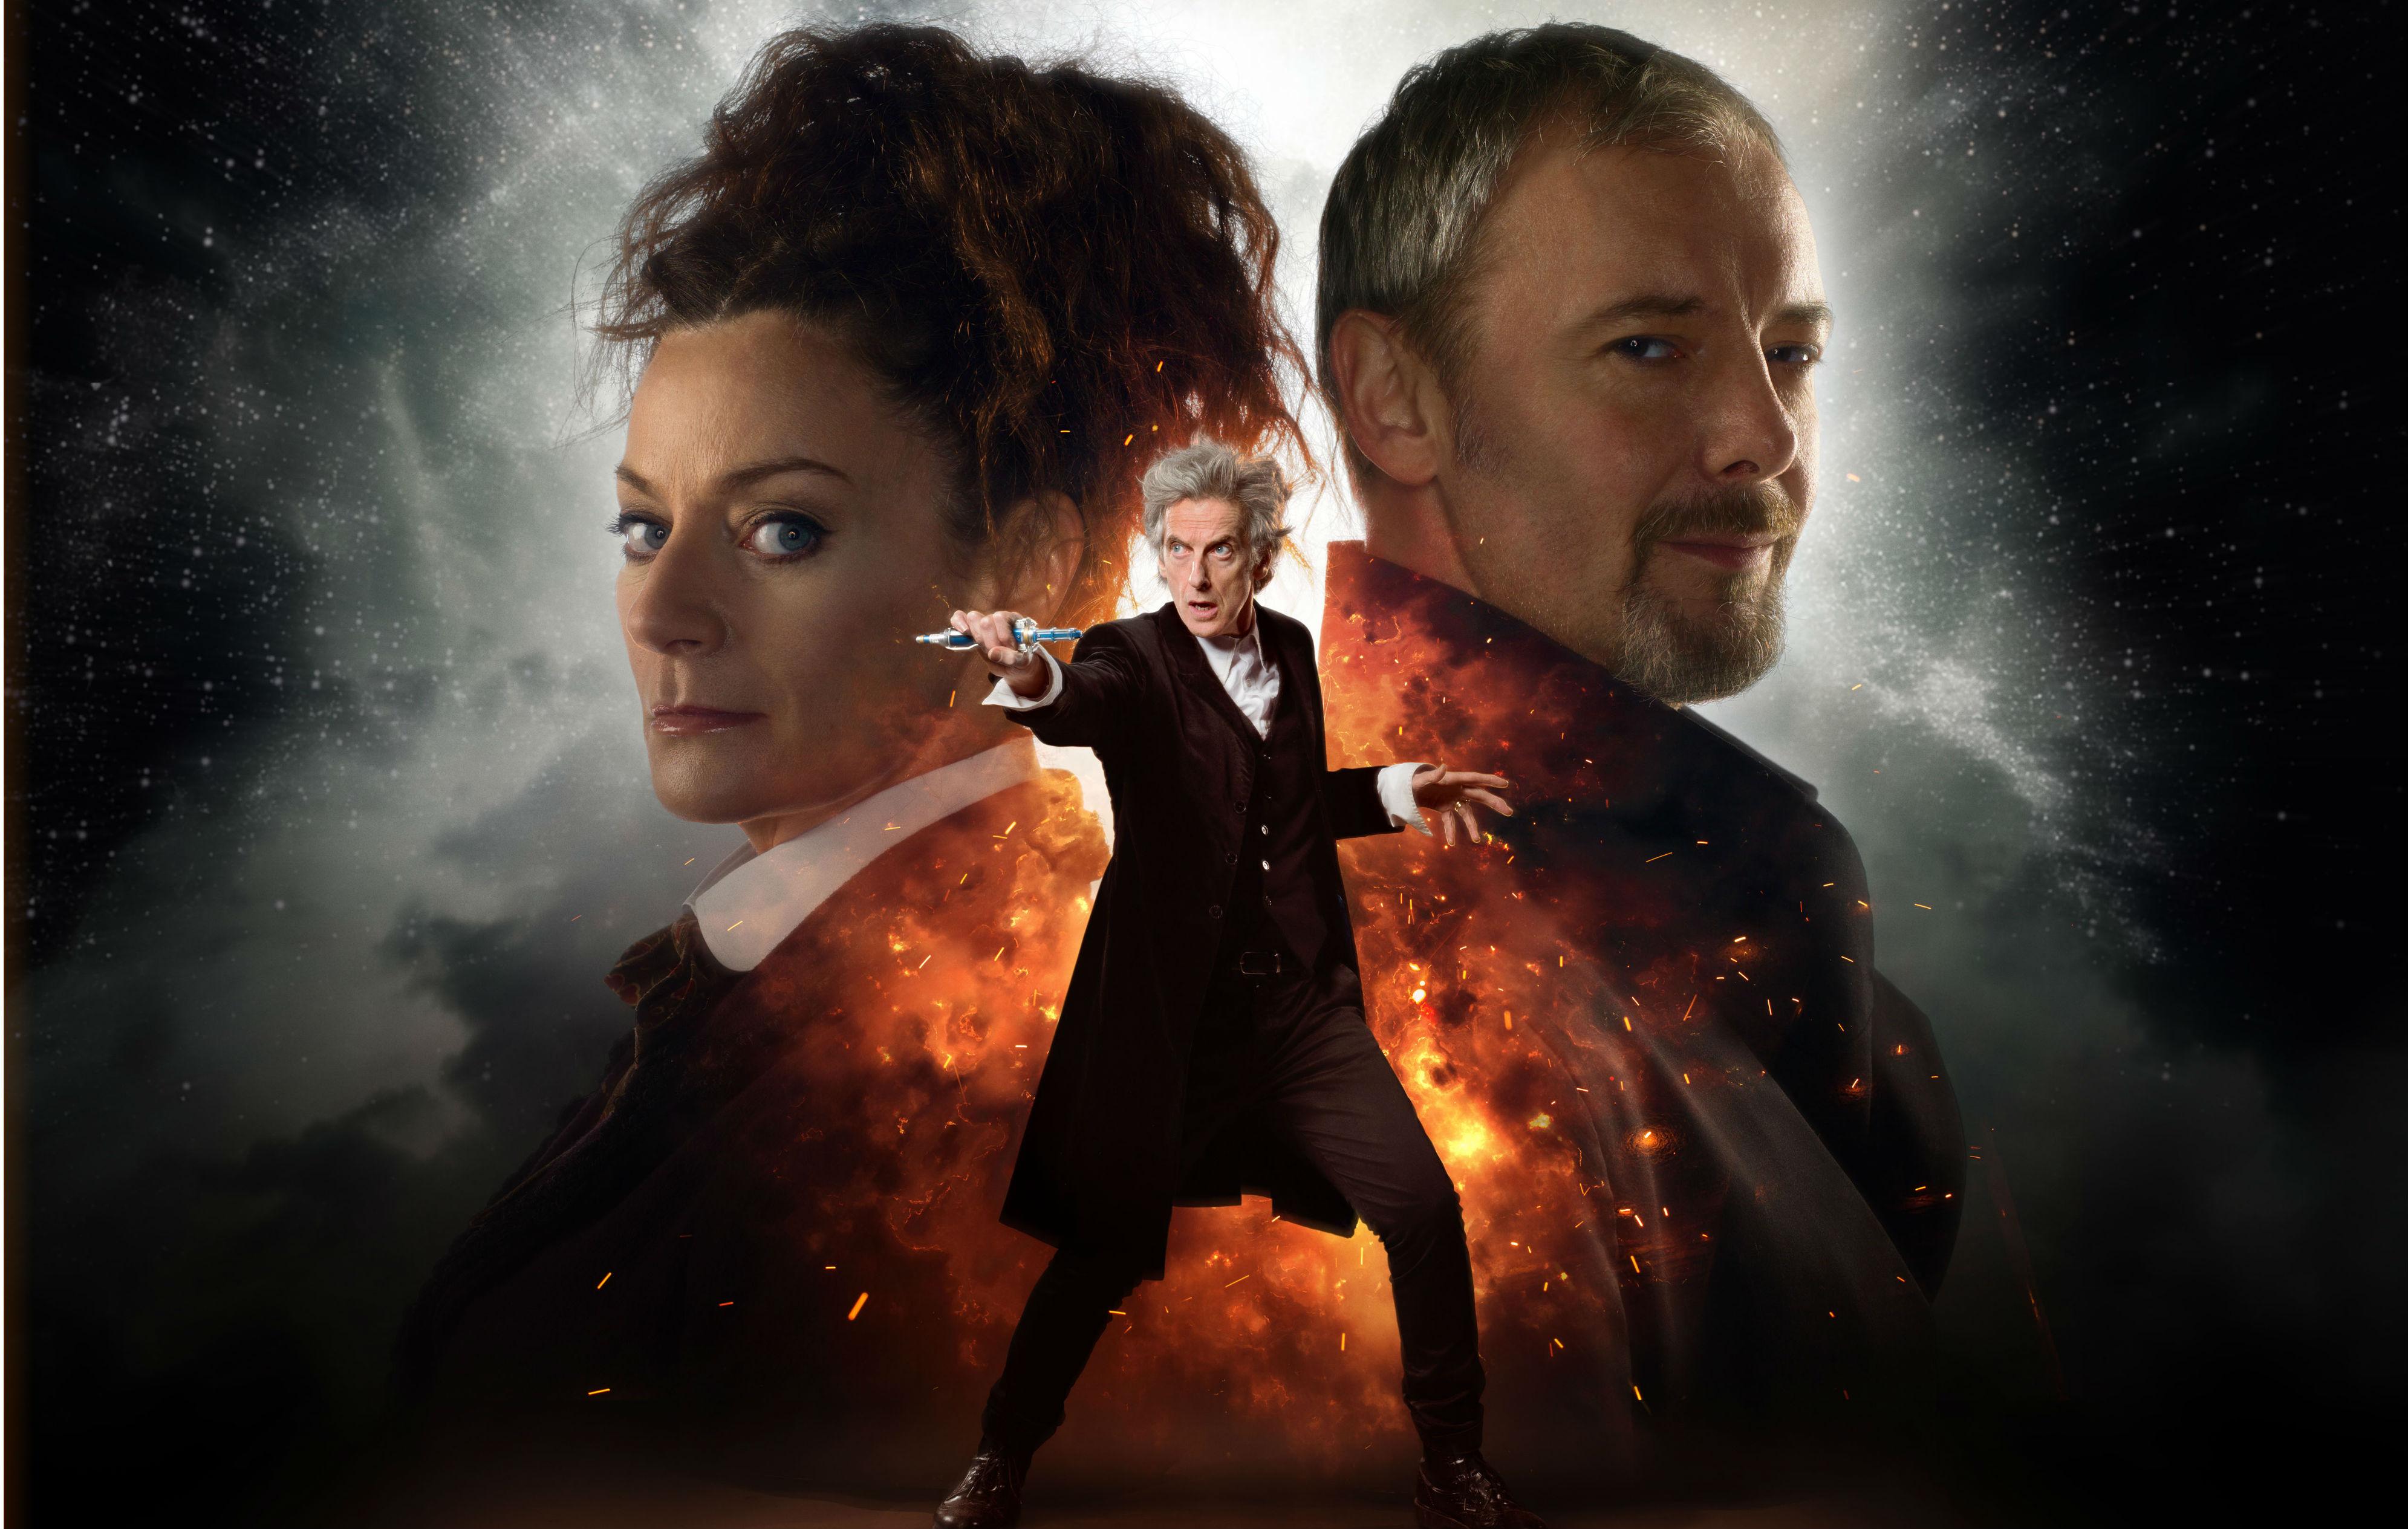 Doctor Who, john simm, series 10 finale